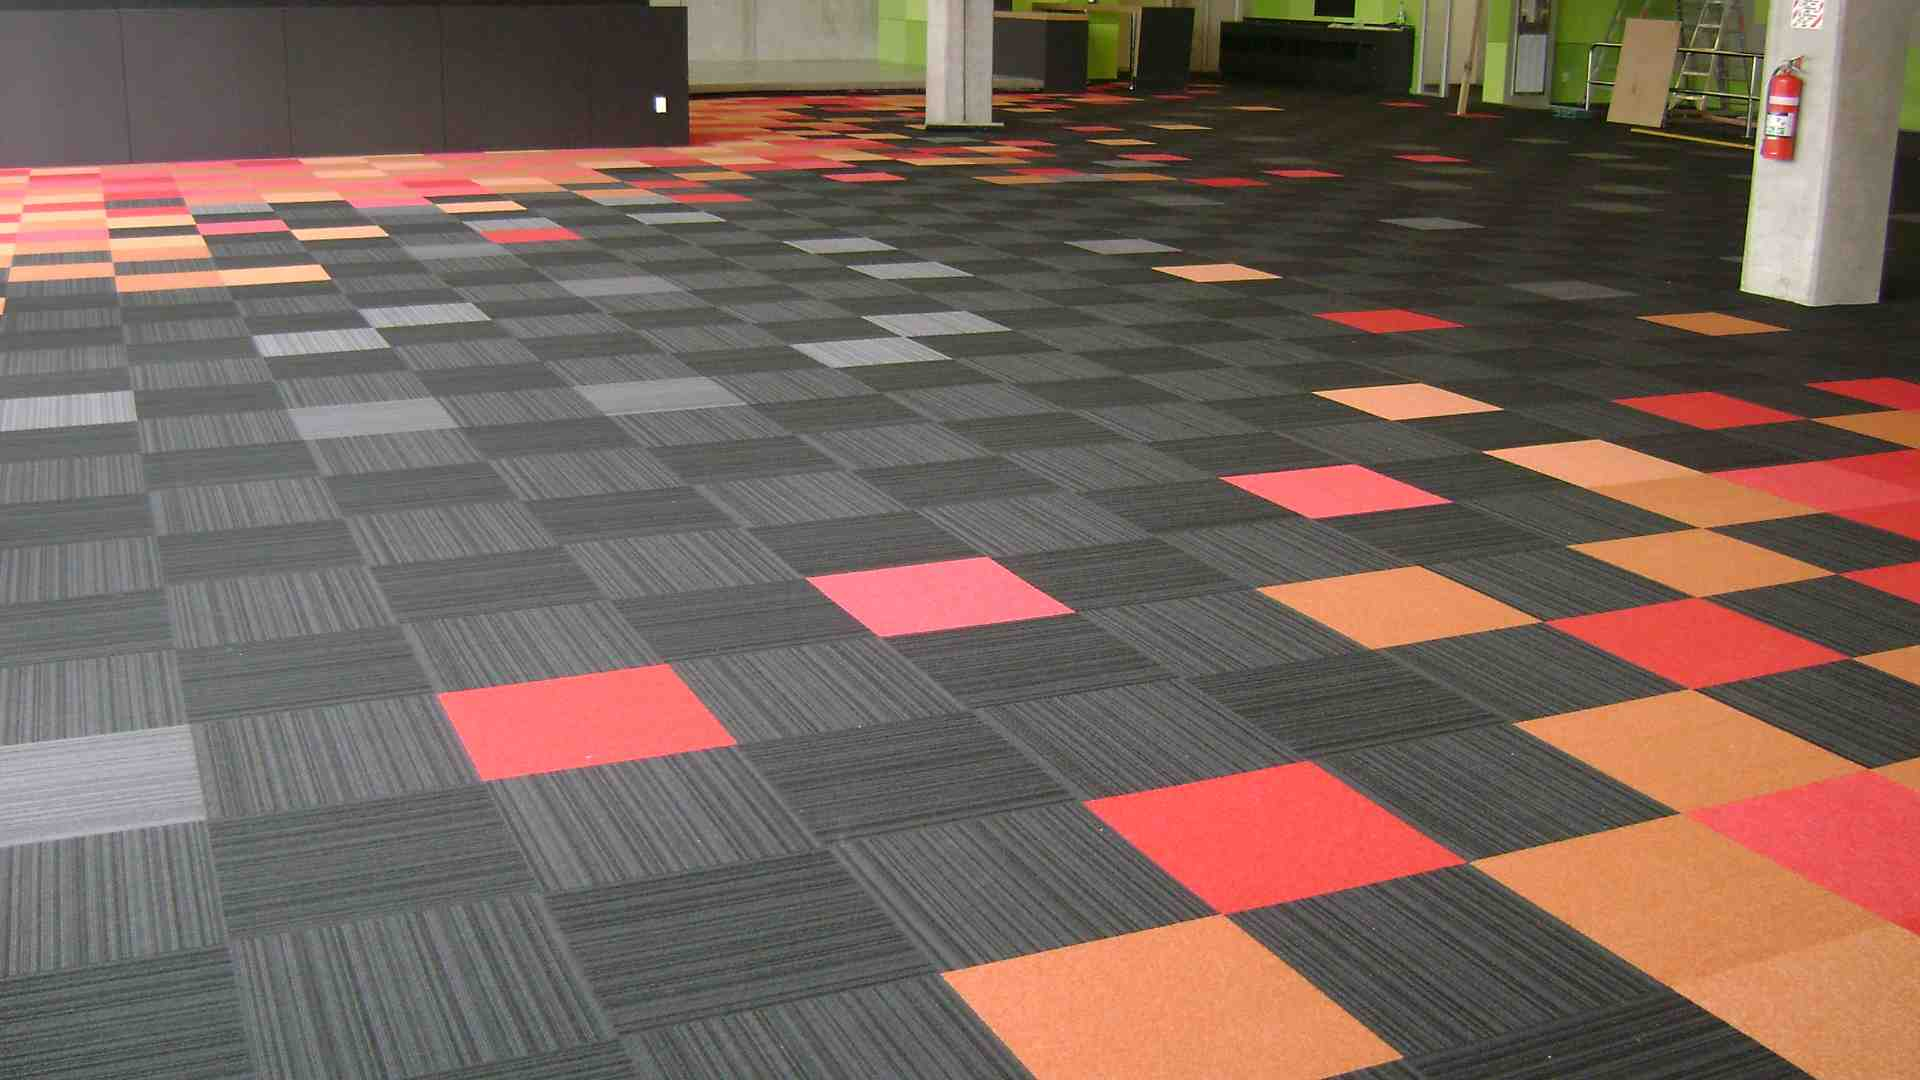 low-cost-carpet-tiles-carpet-squares-menards-menards-carpet-squares-cheap-carpet-squares-lowes-carpet-tiles-menards-carpeting-waterproof-carpet-tiles-self-stick-carpet-tiles-legato-carpet-t